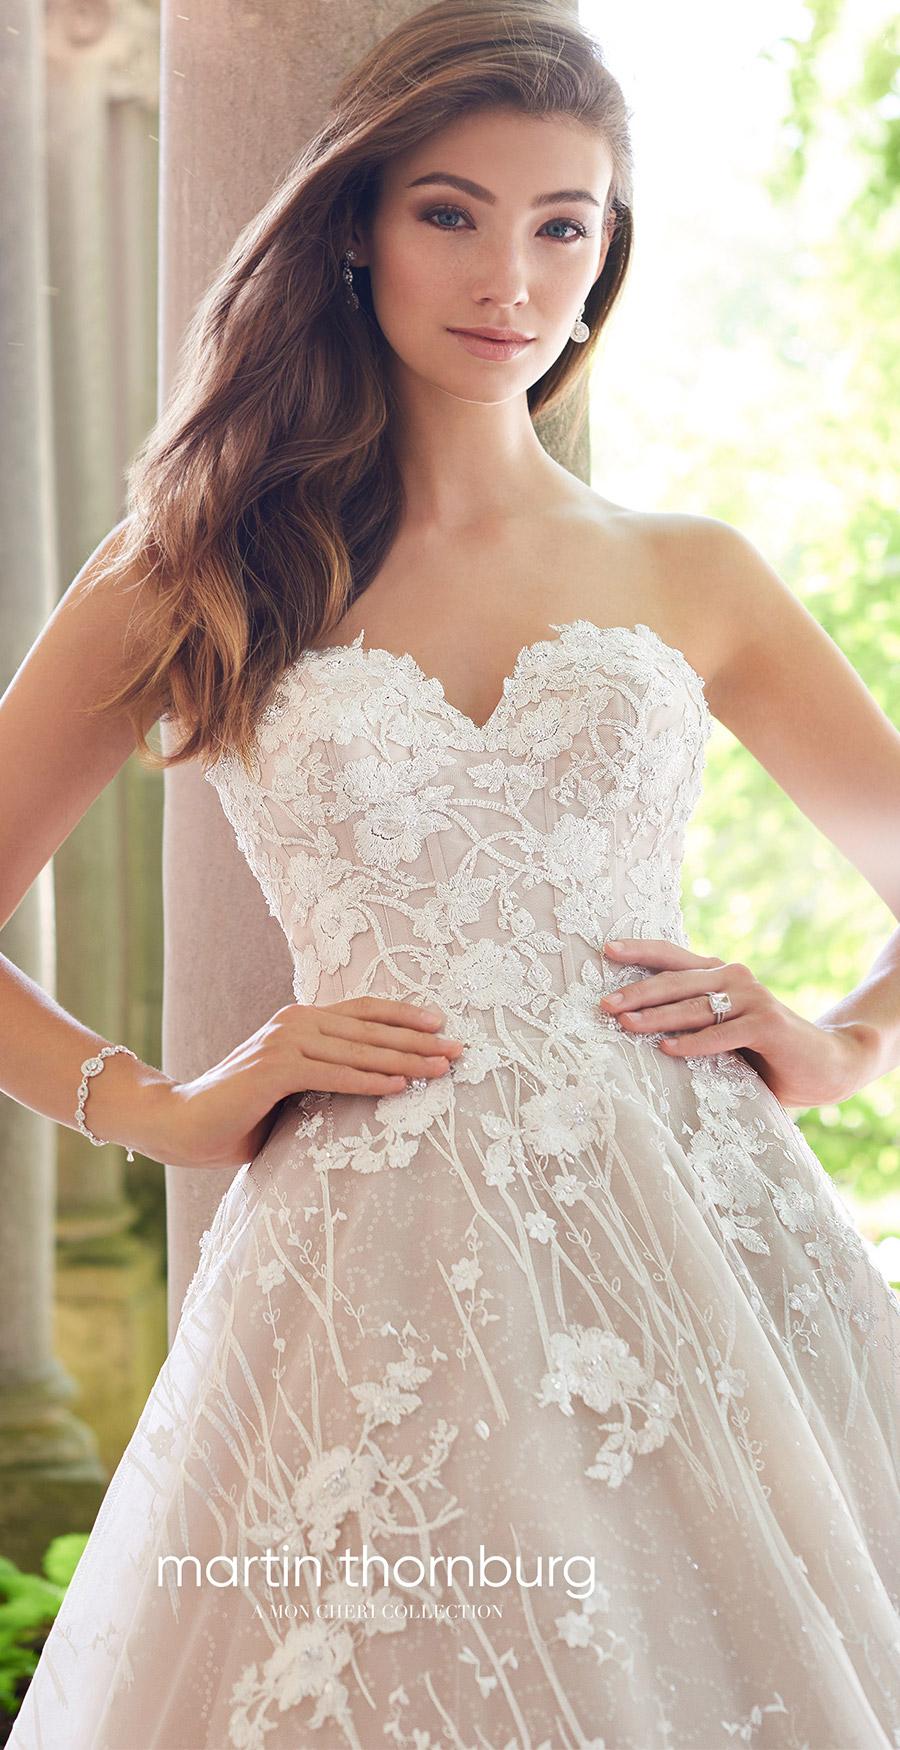 martin thornburg mon cheri spring 2018 bridal strapless sweetheart beaded bodice a line lace wedding dress (118281 coda) zv elegant romantic